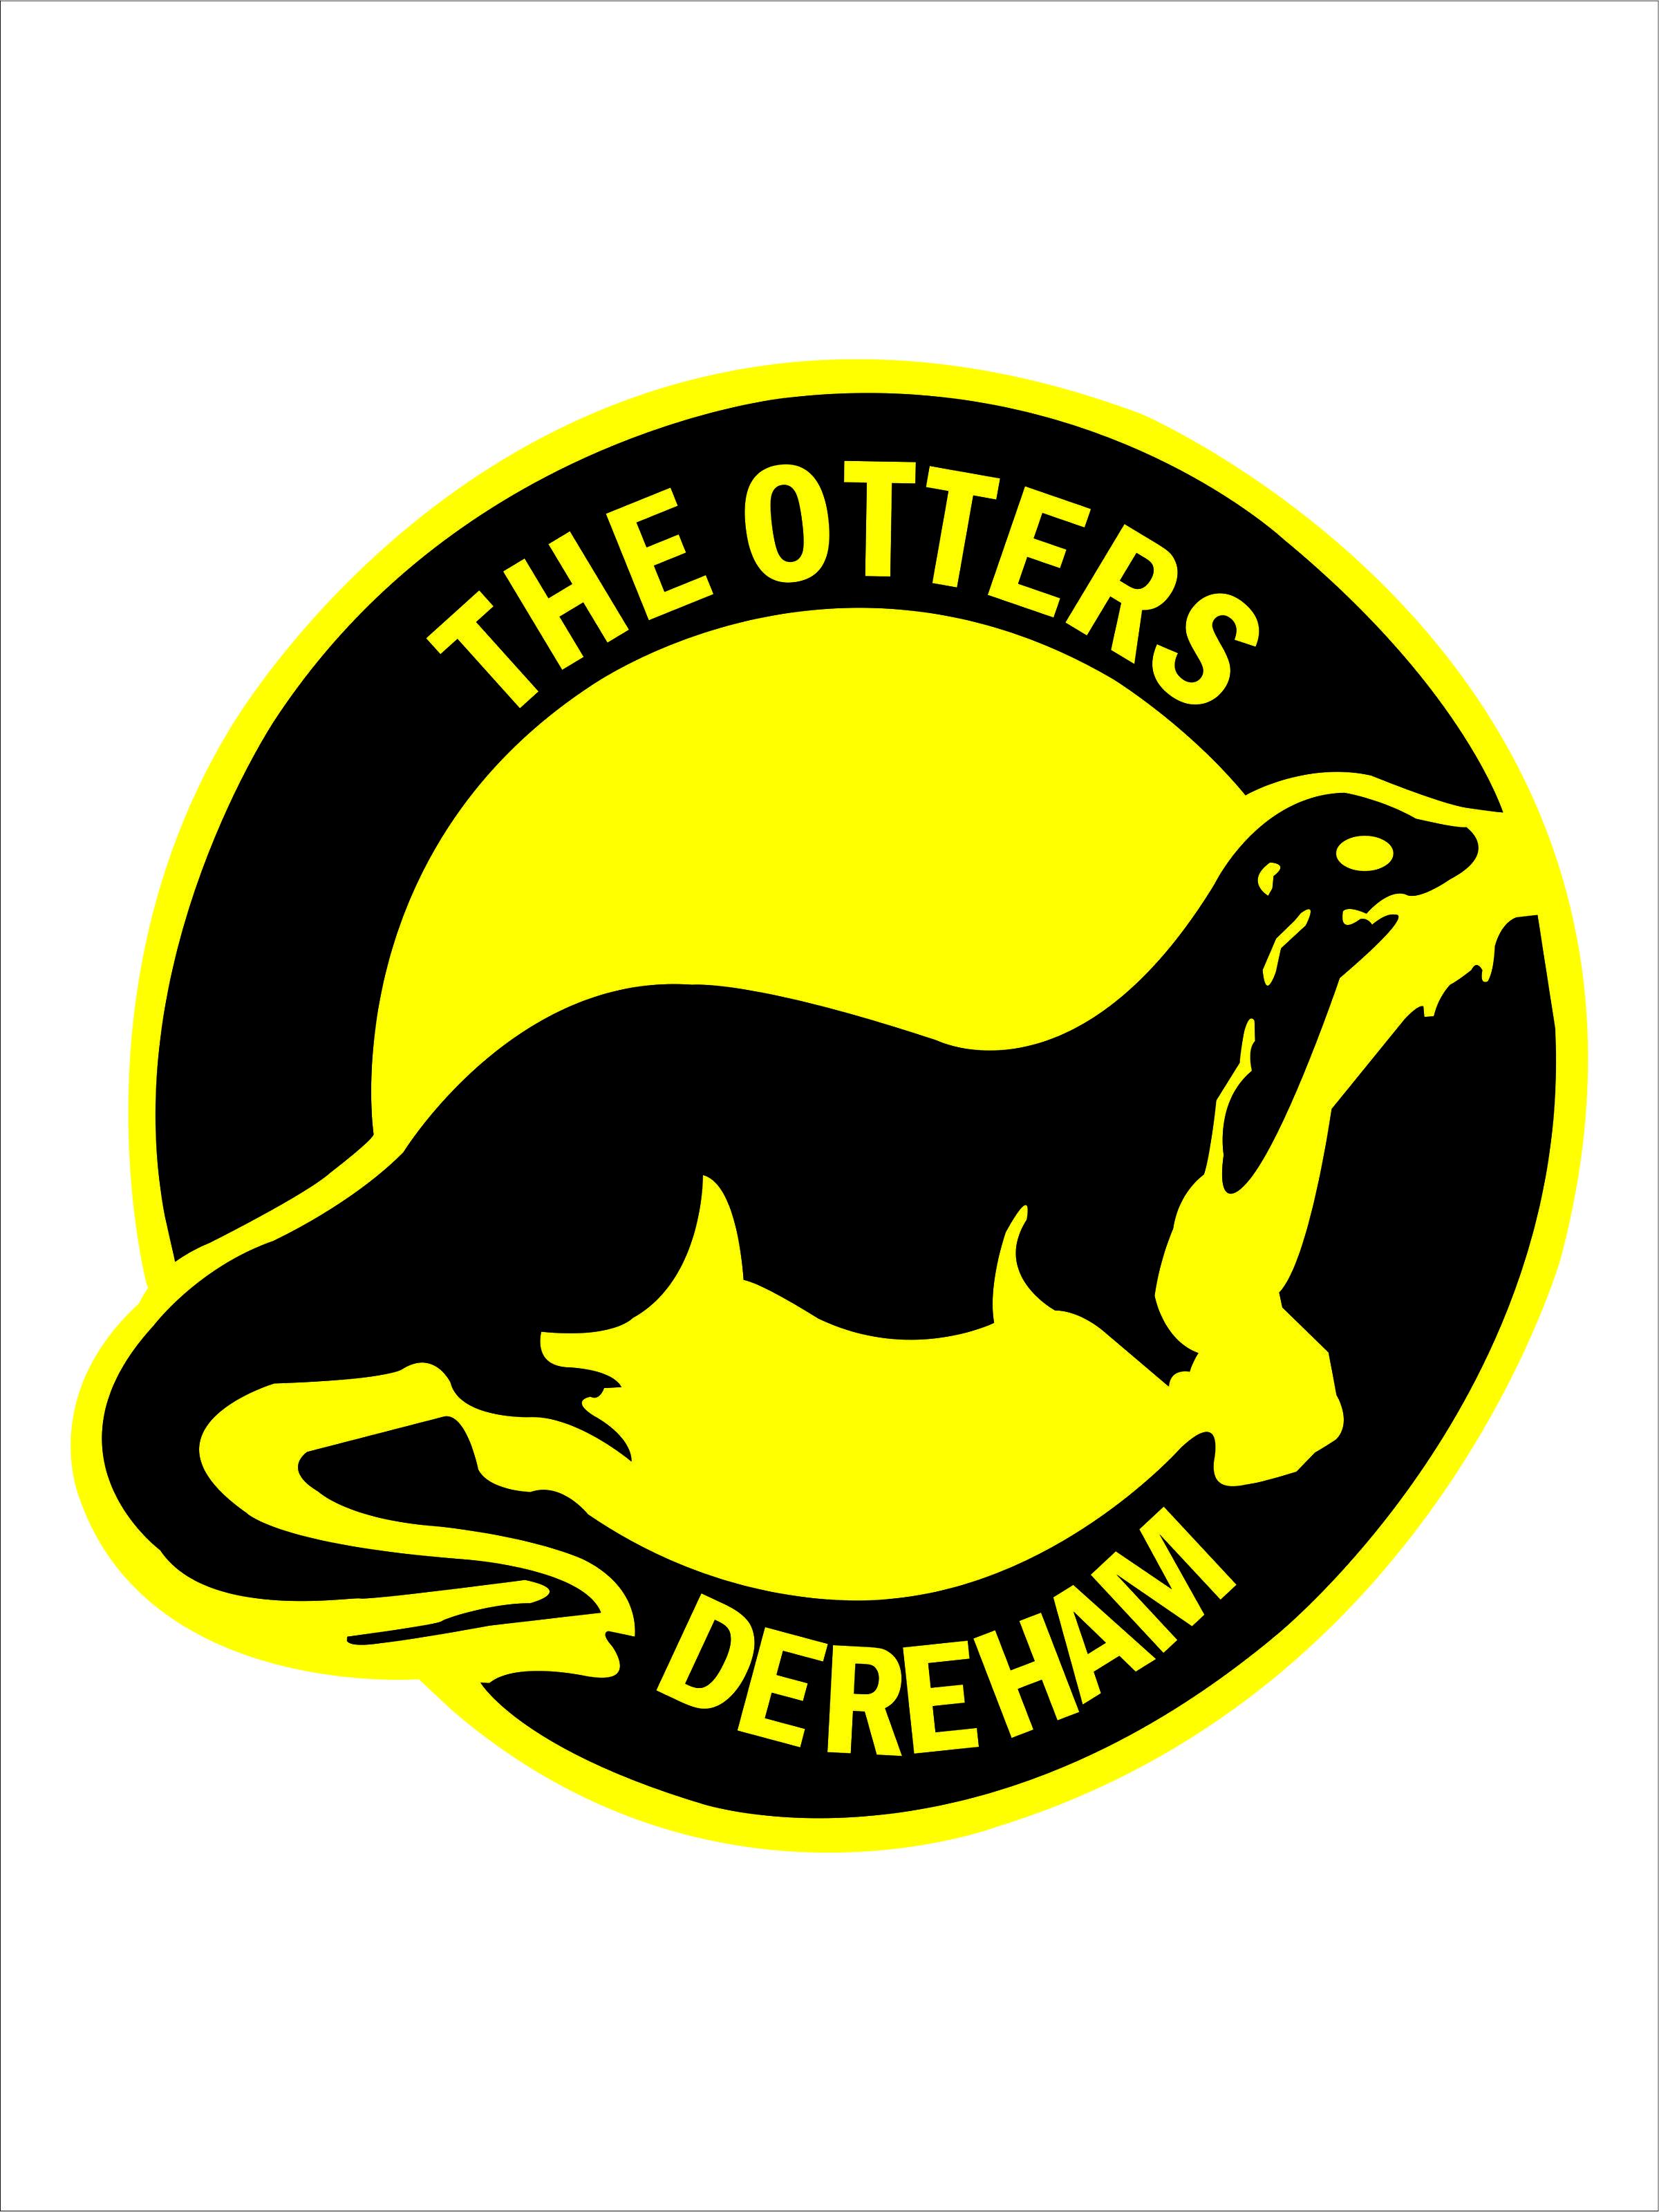 Dereham Otters